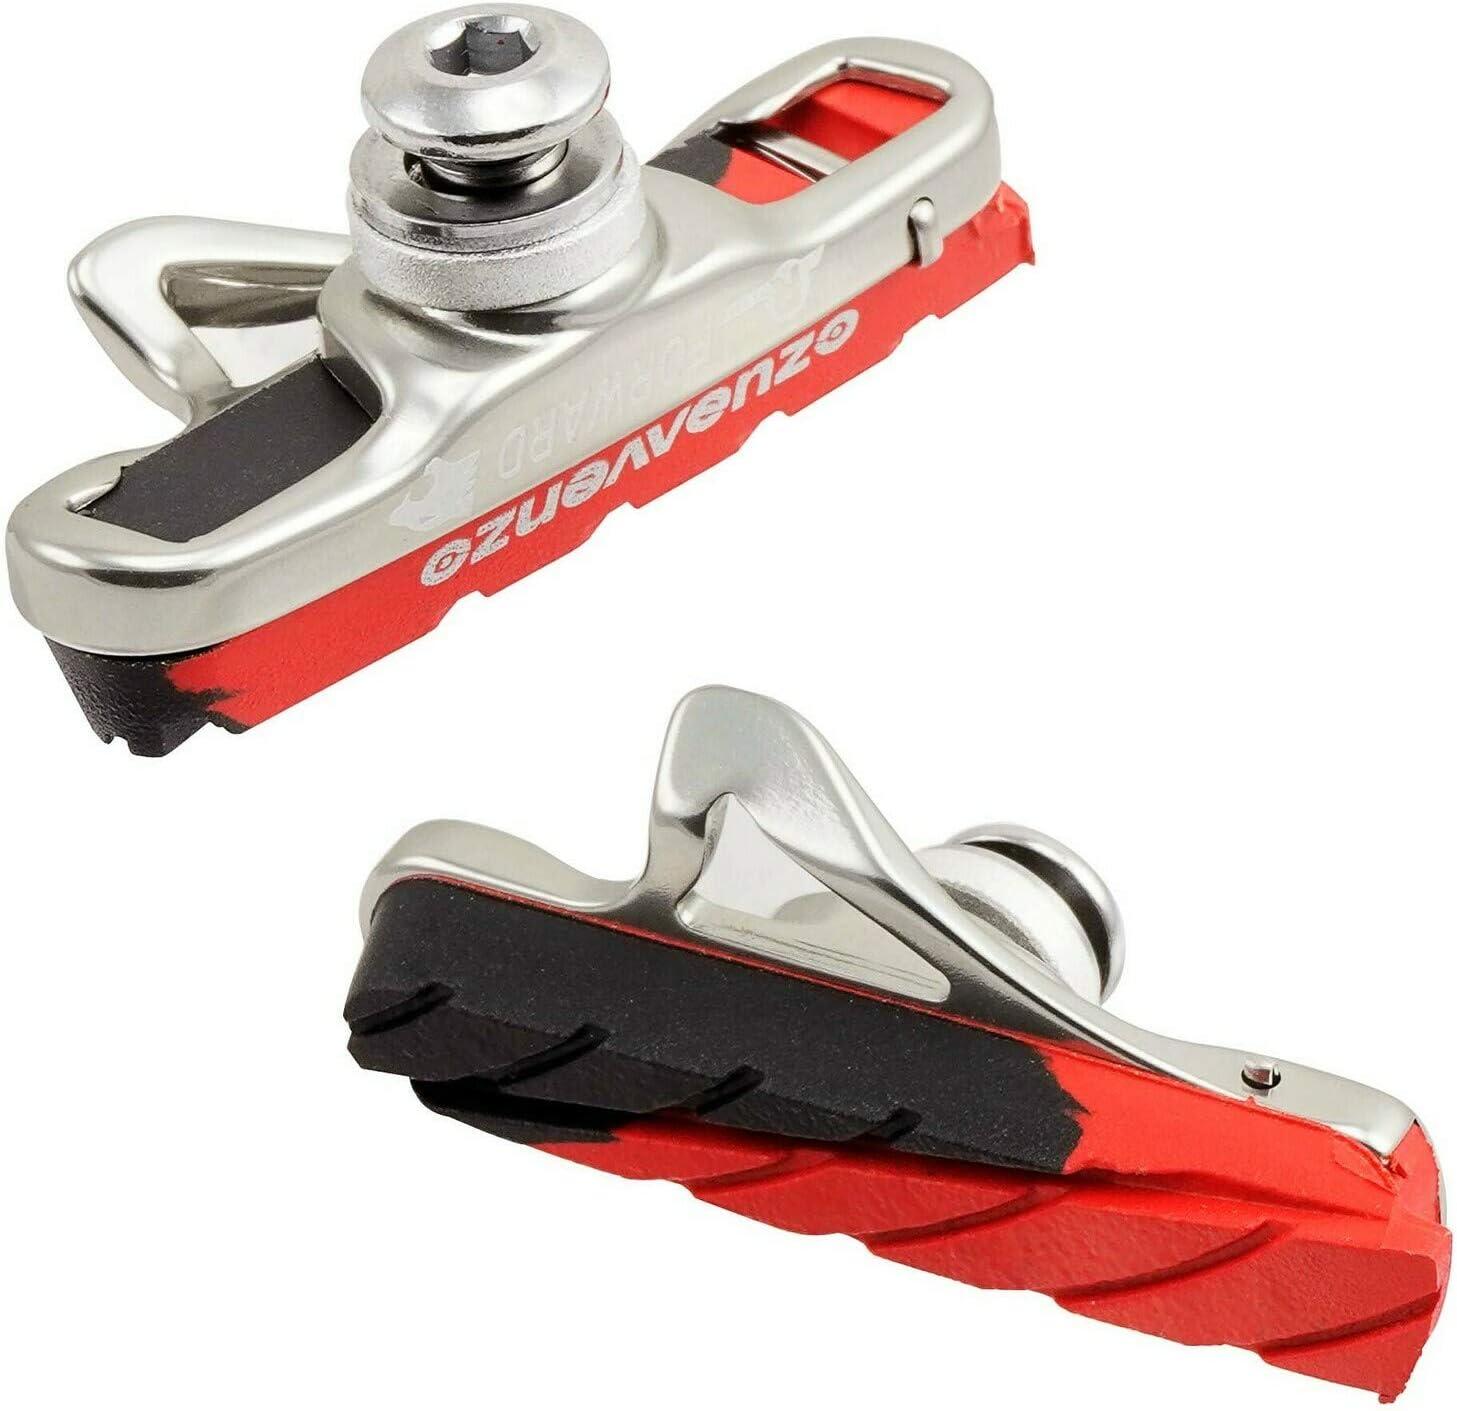 Dura-Ace Ultegra 105 4pads Shimano R55C4 Cartridge Road Brake Shoes 2 Pair